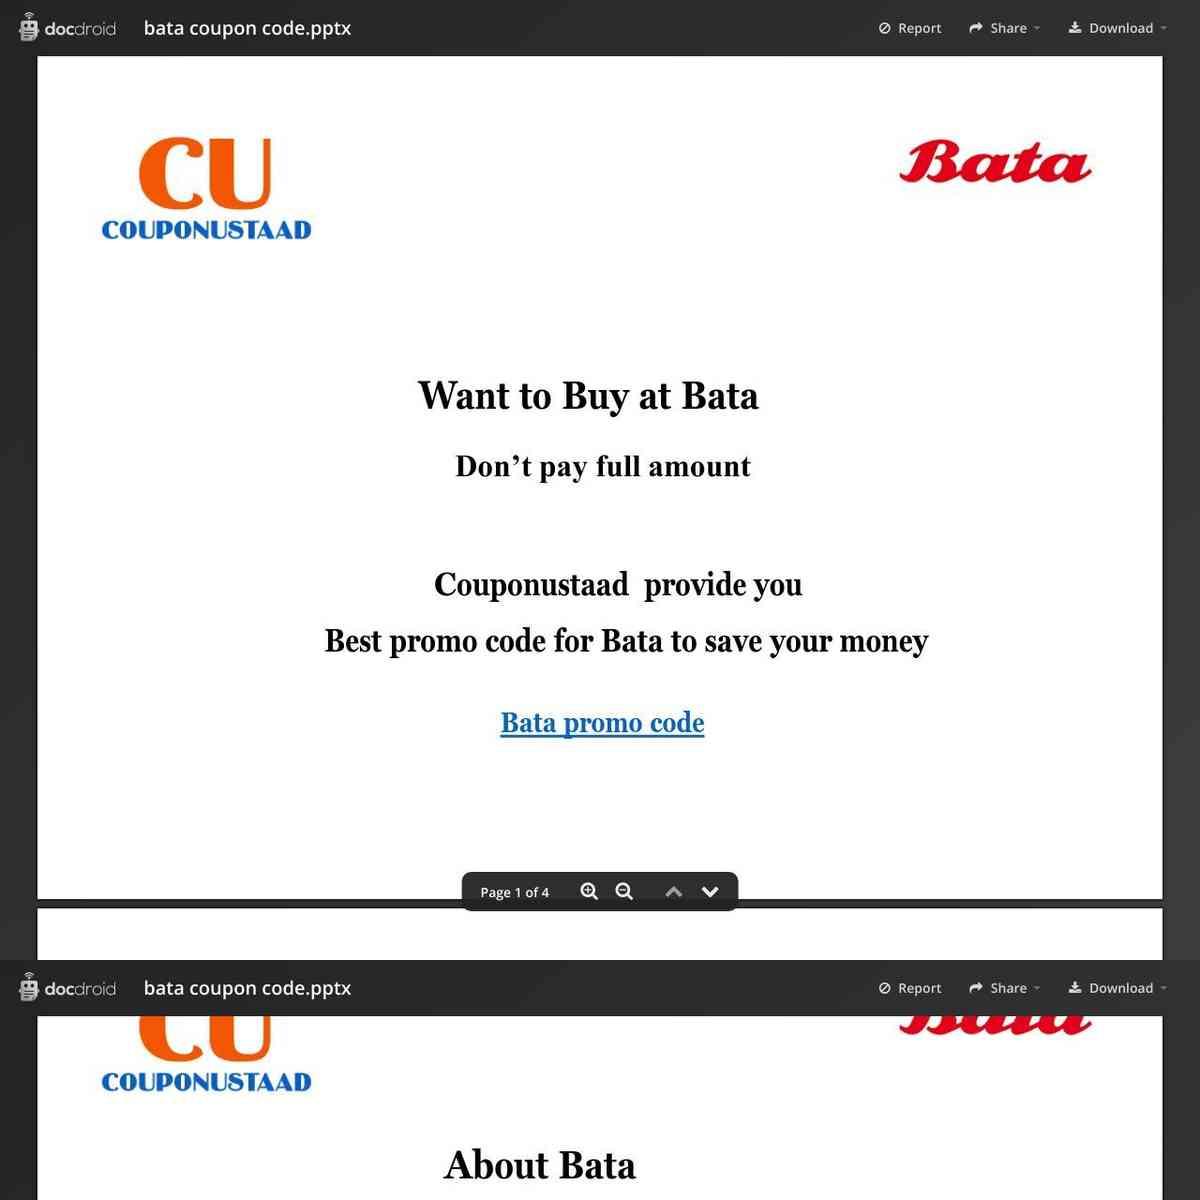 docdroid.net/O2QYDkQ/bata-coupon-code-pptx